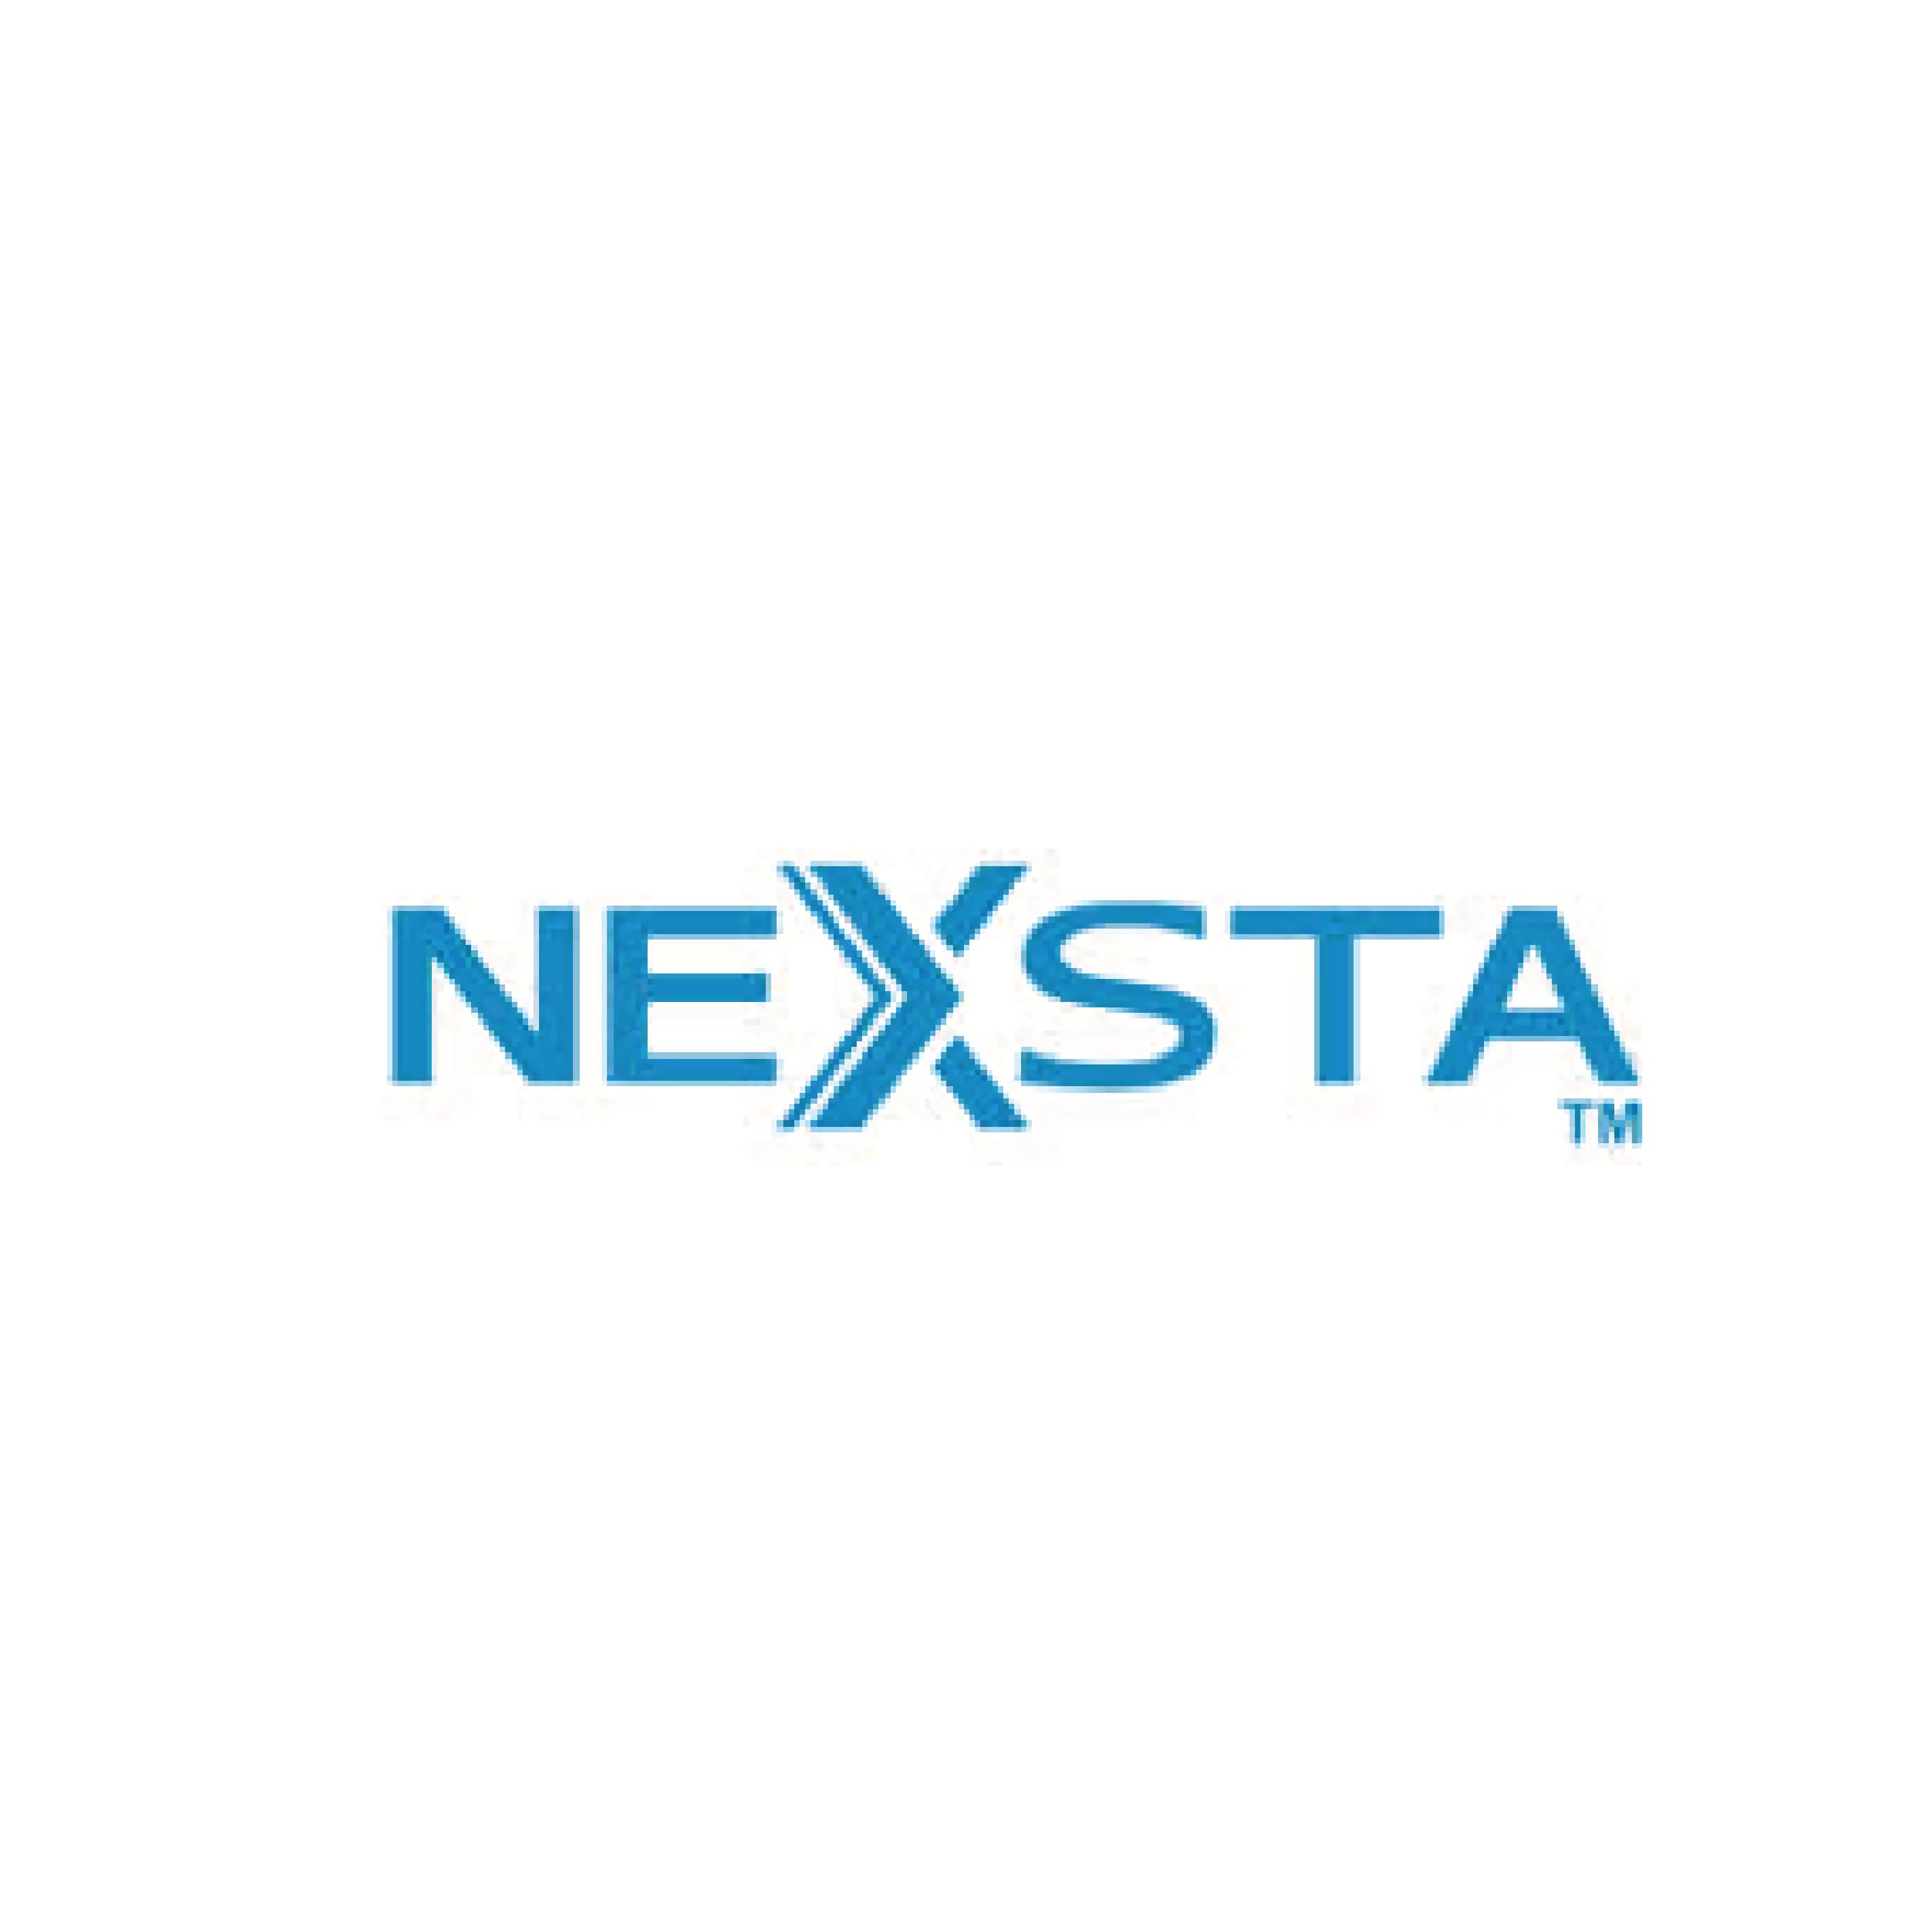 Beli produk Nexsta di Arsitag